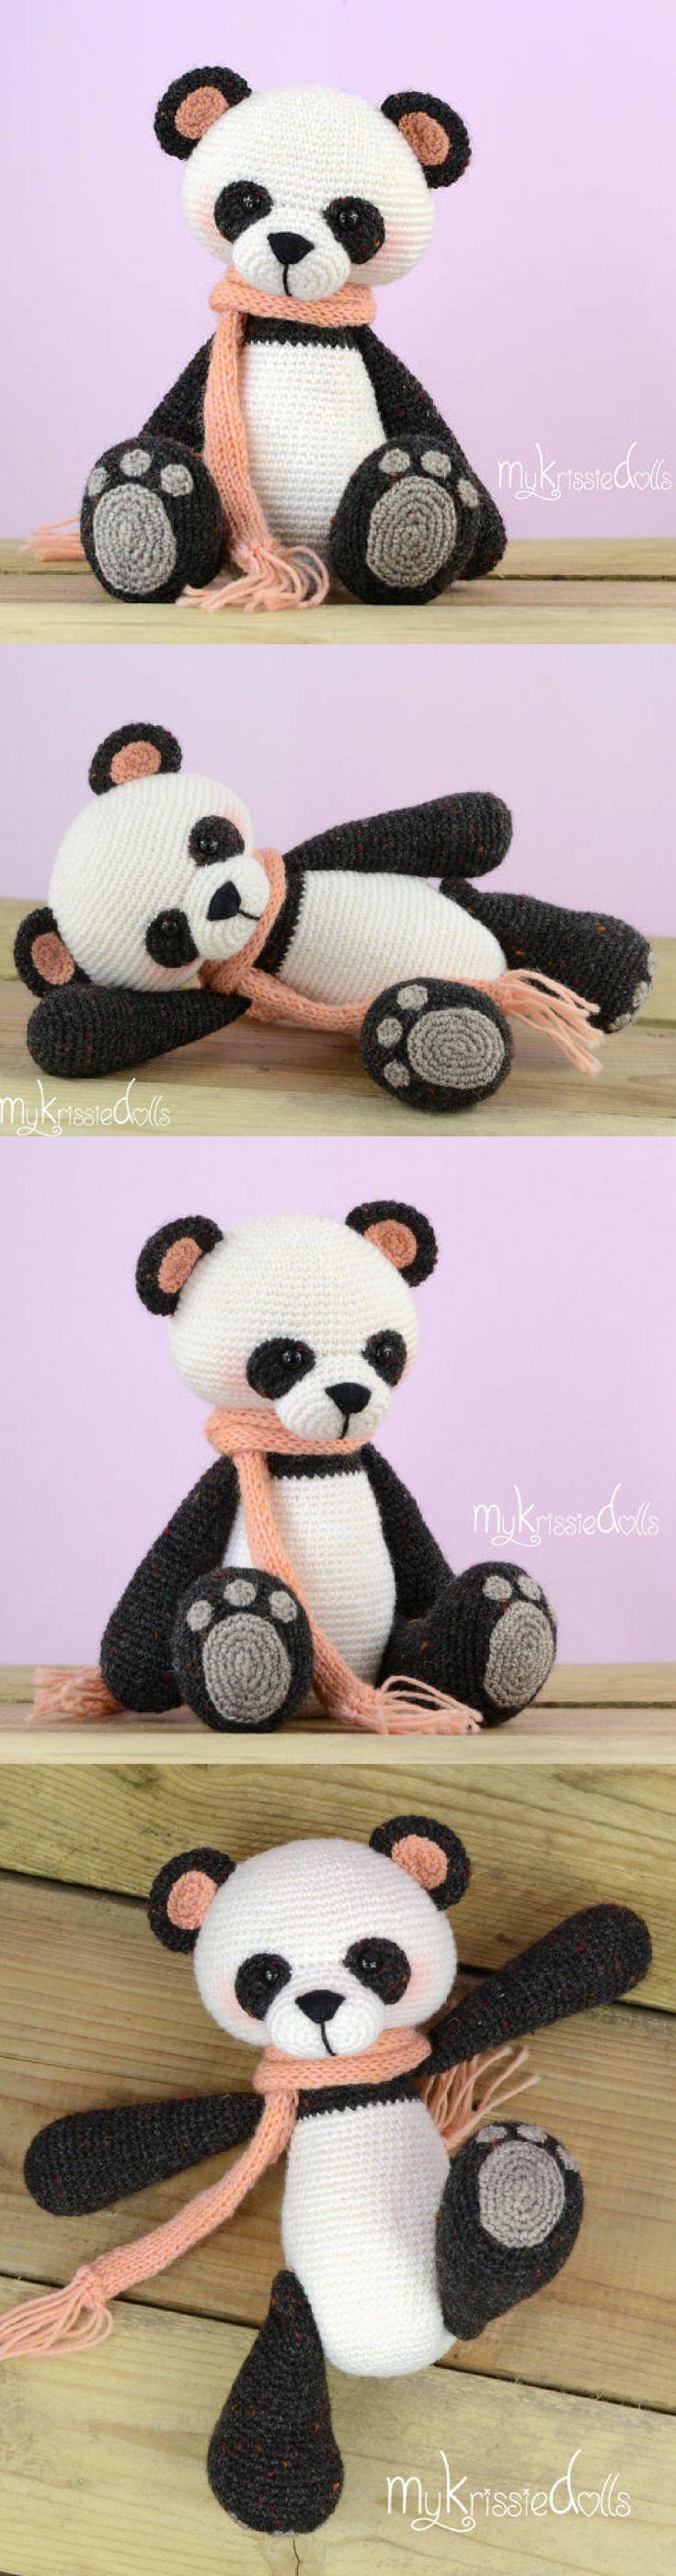 Amigurumi Panda Bear Crochet Pattern Printable PDF #ad #amigurumi #amigurumidoll #amigurumipattern #amigurumitoy #amigurumiaddict #crochet #crocheting #crochetpattern #pattern #patternsforcrochet #printable #instantdownload #panda #crochetbear